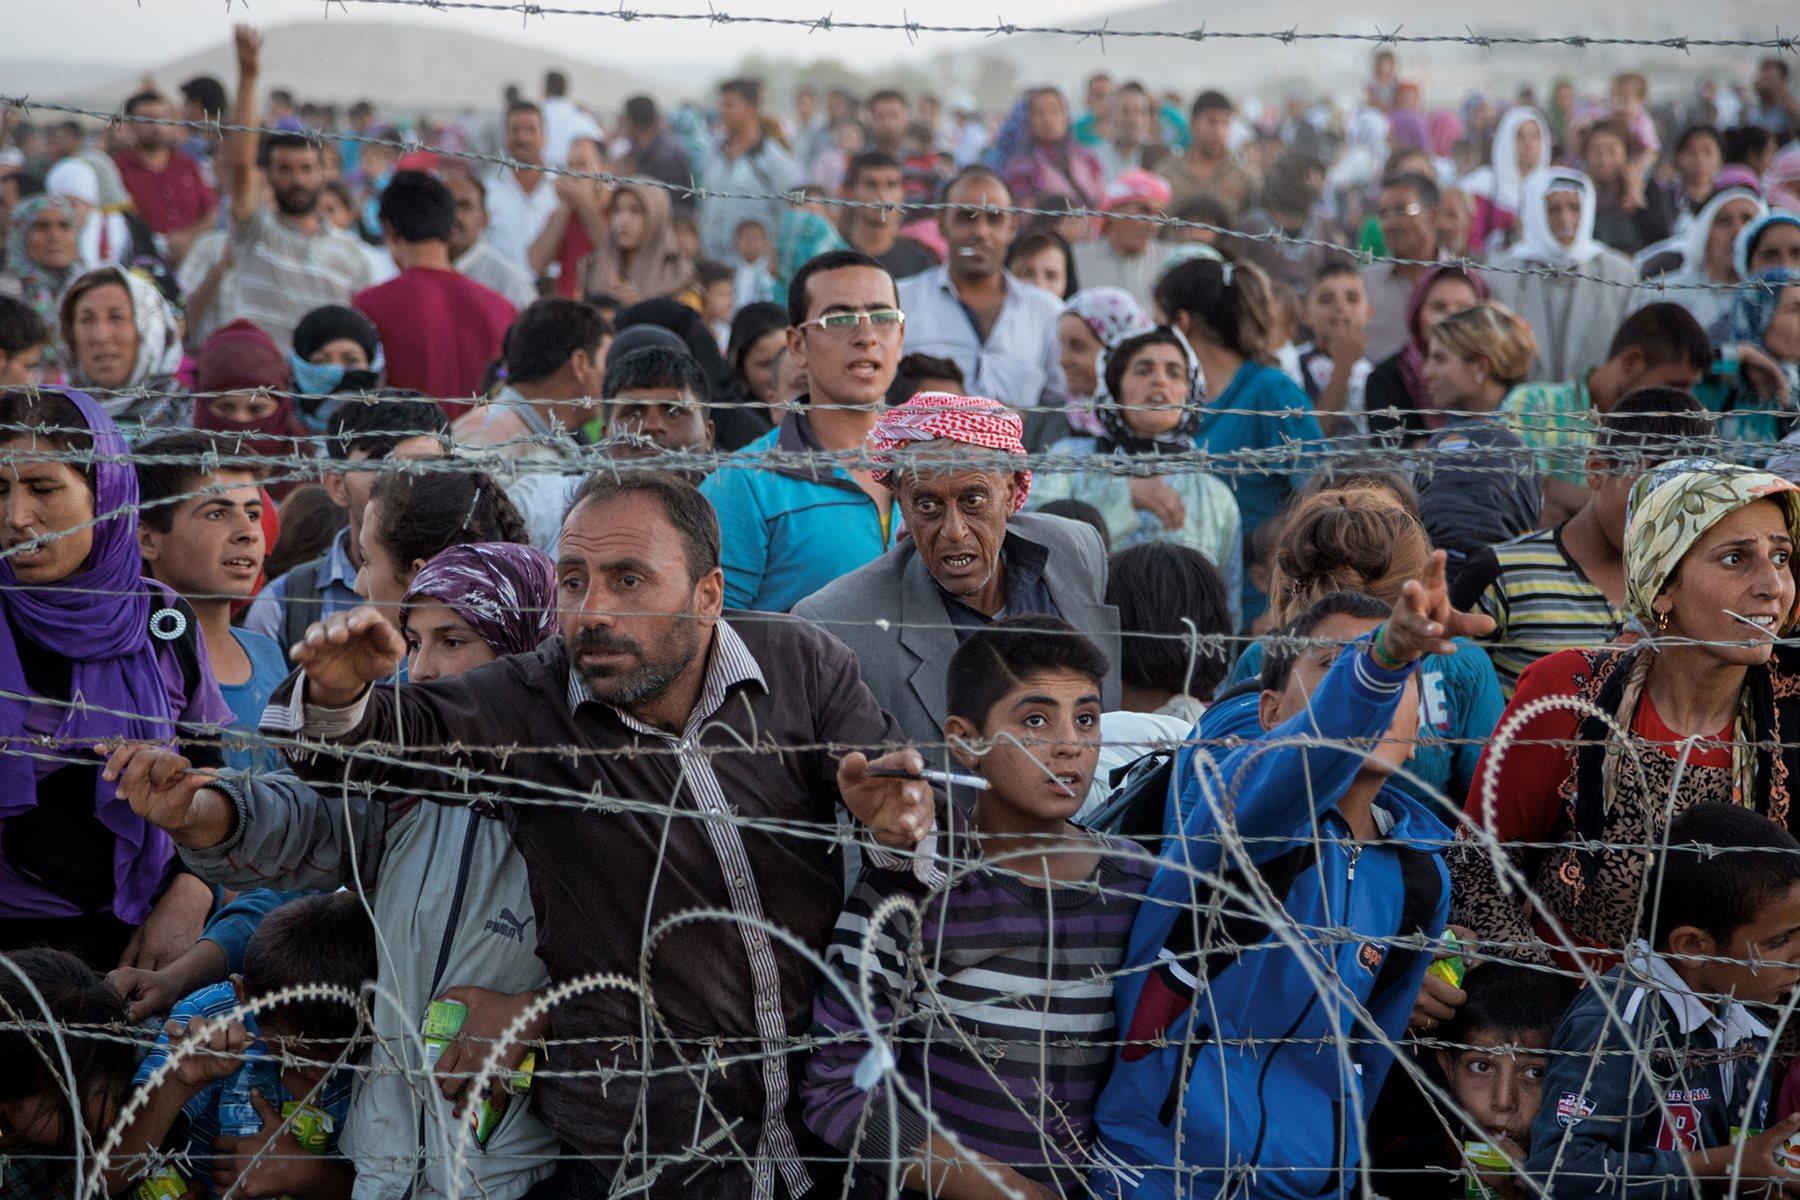 Denuncian explotación de refugiados sirios por parte de firmas internacionales de moda